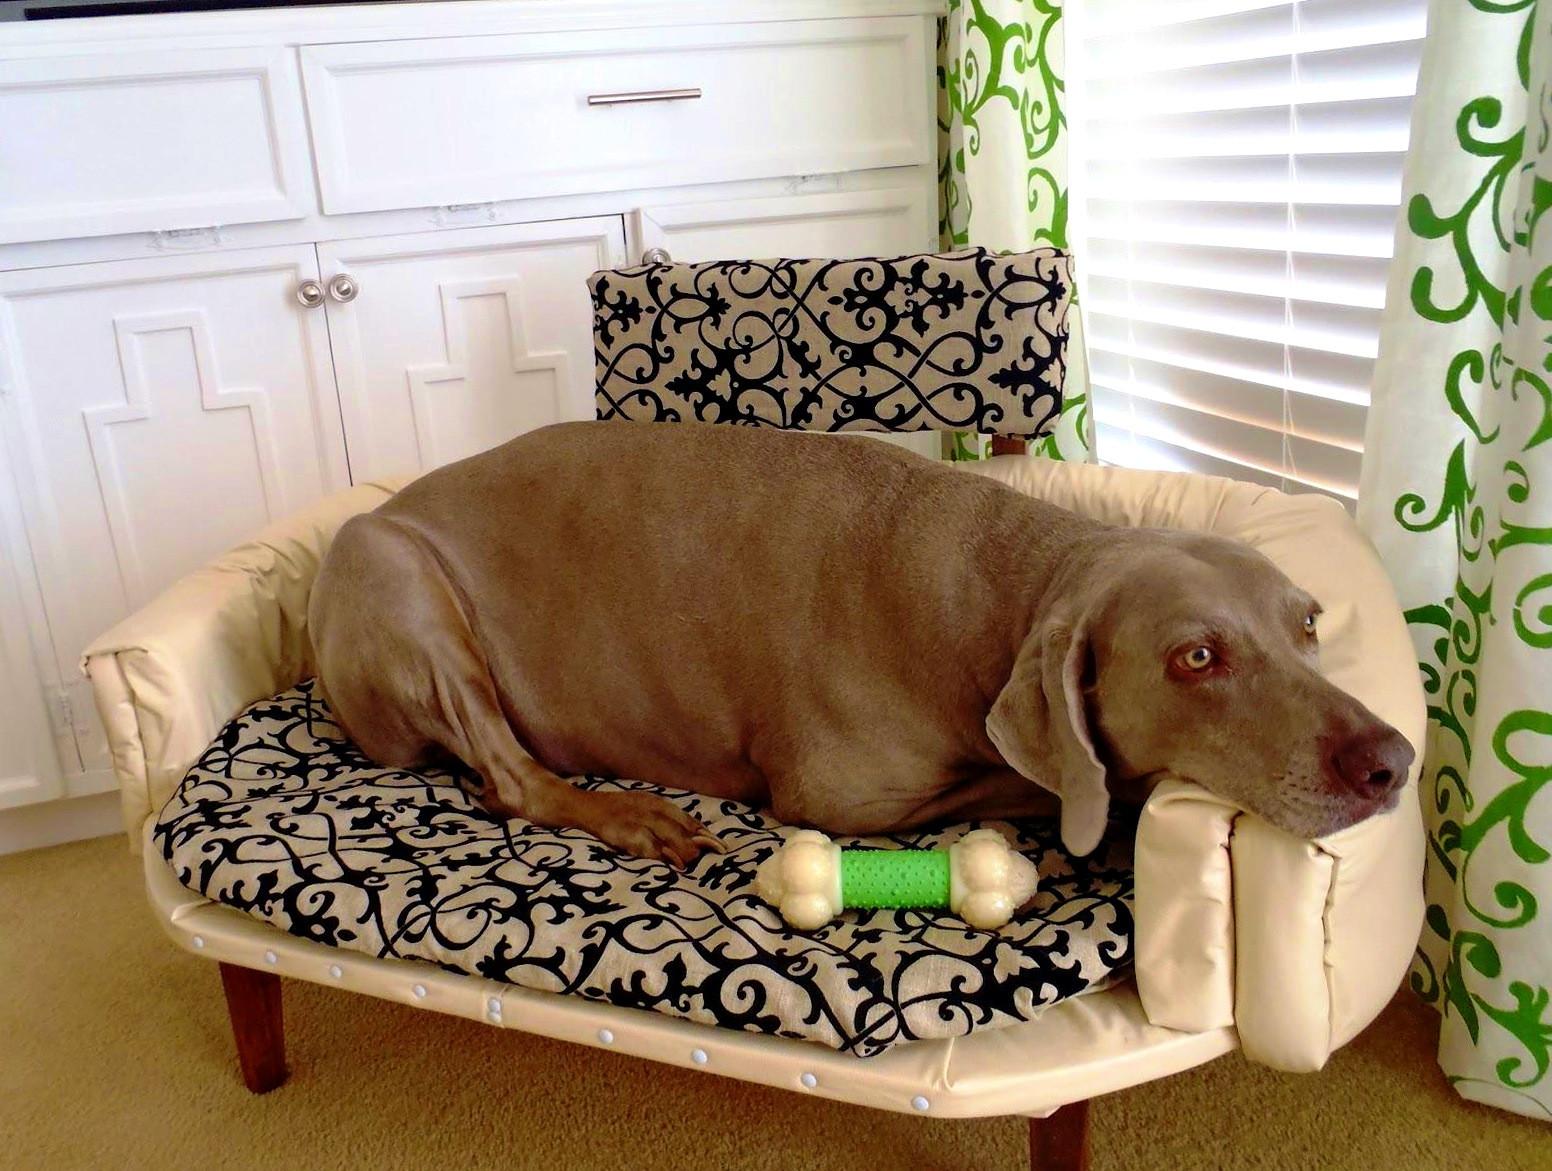 DIY Indestructible Dog Crate  Bedroom Delightful Diy Indestructible Dog Bed Home Design